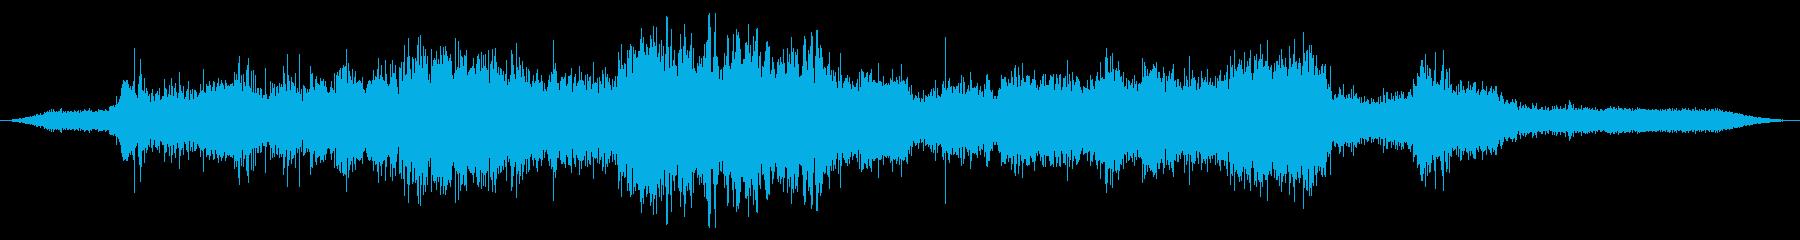 Ext:オンボード:アイドル、高速...の再生済みの波形